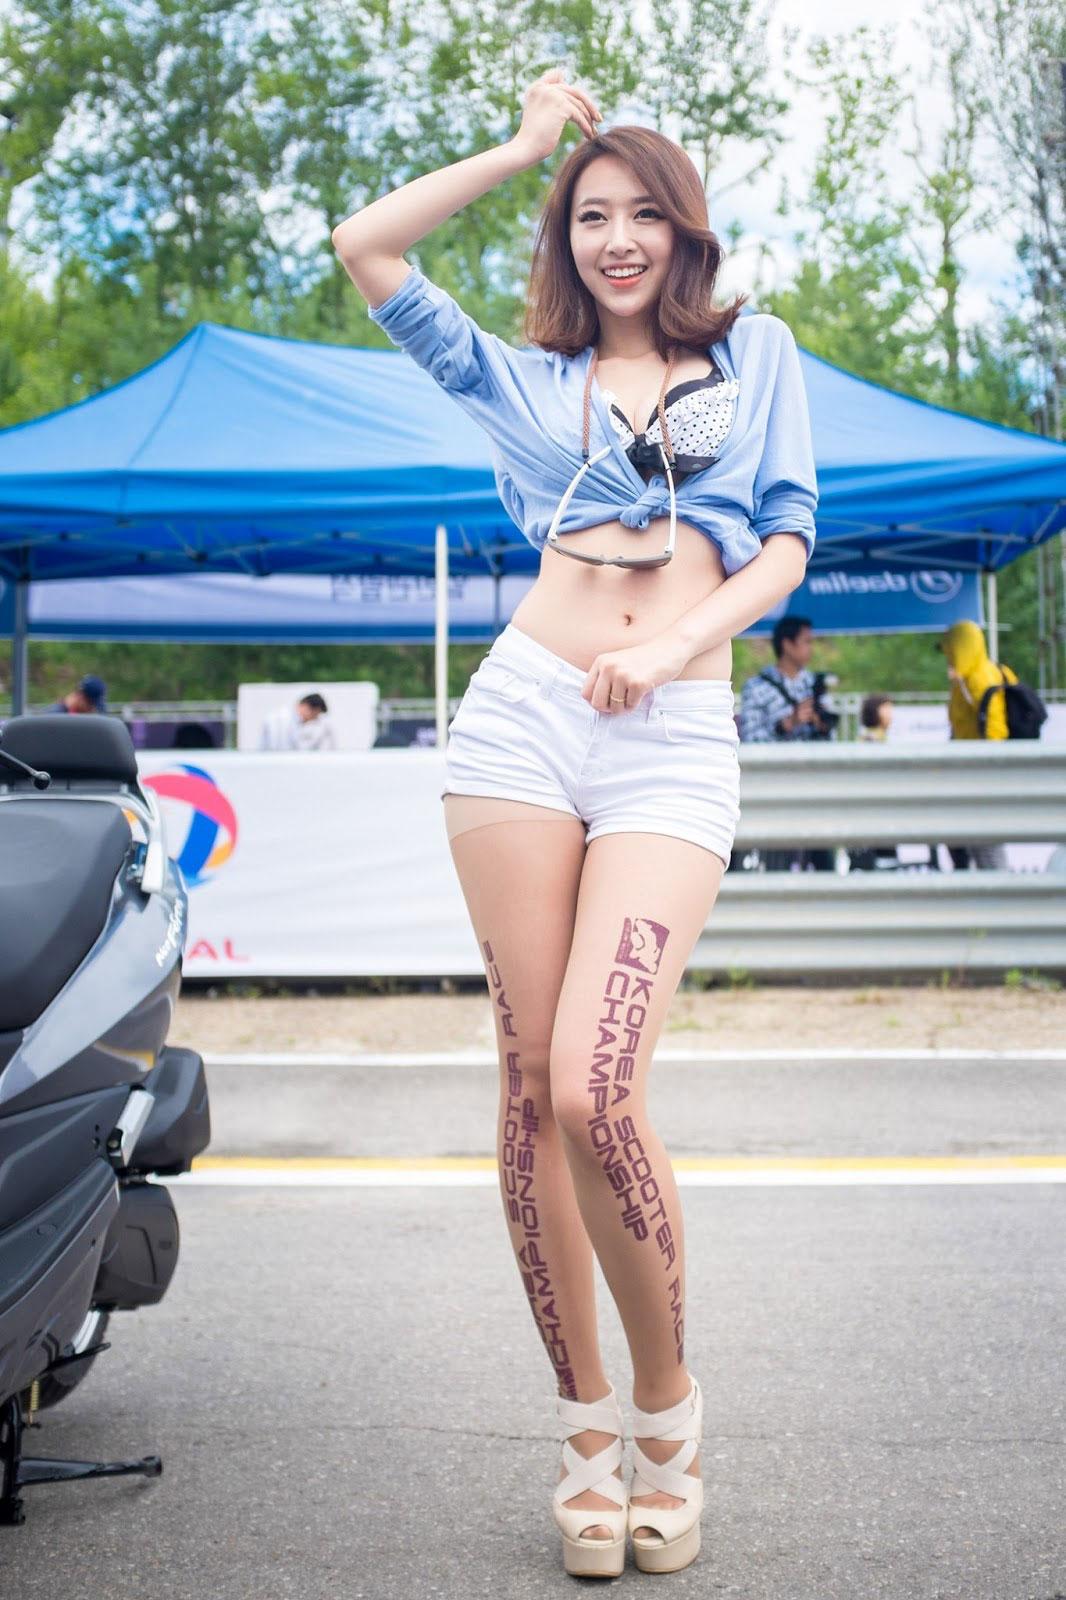 Shin HaeRi Korea Scooter Race 2013